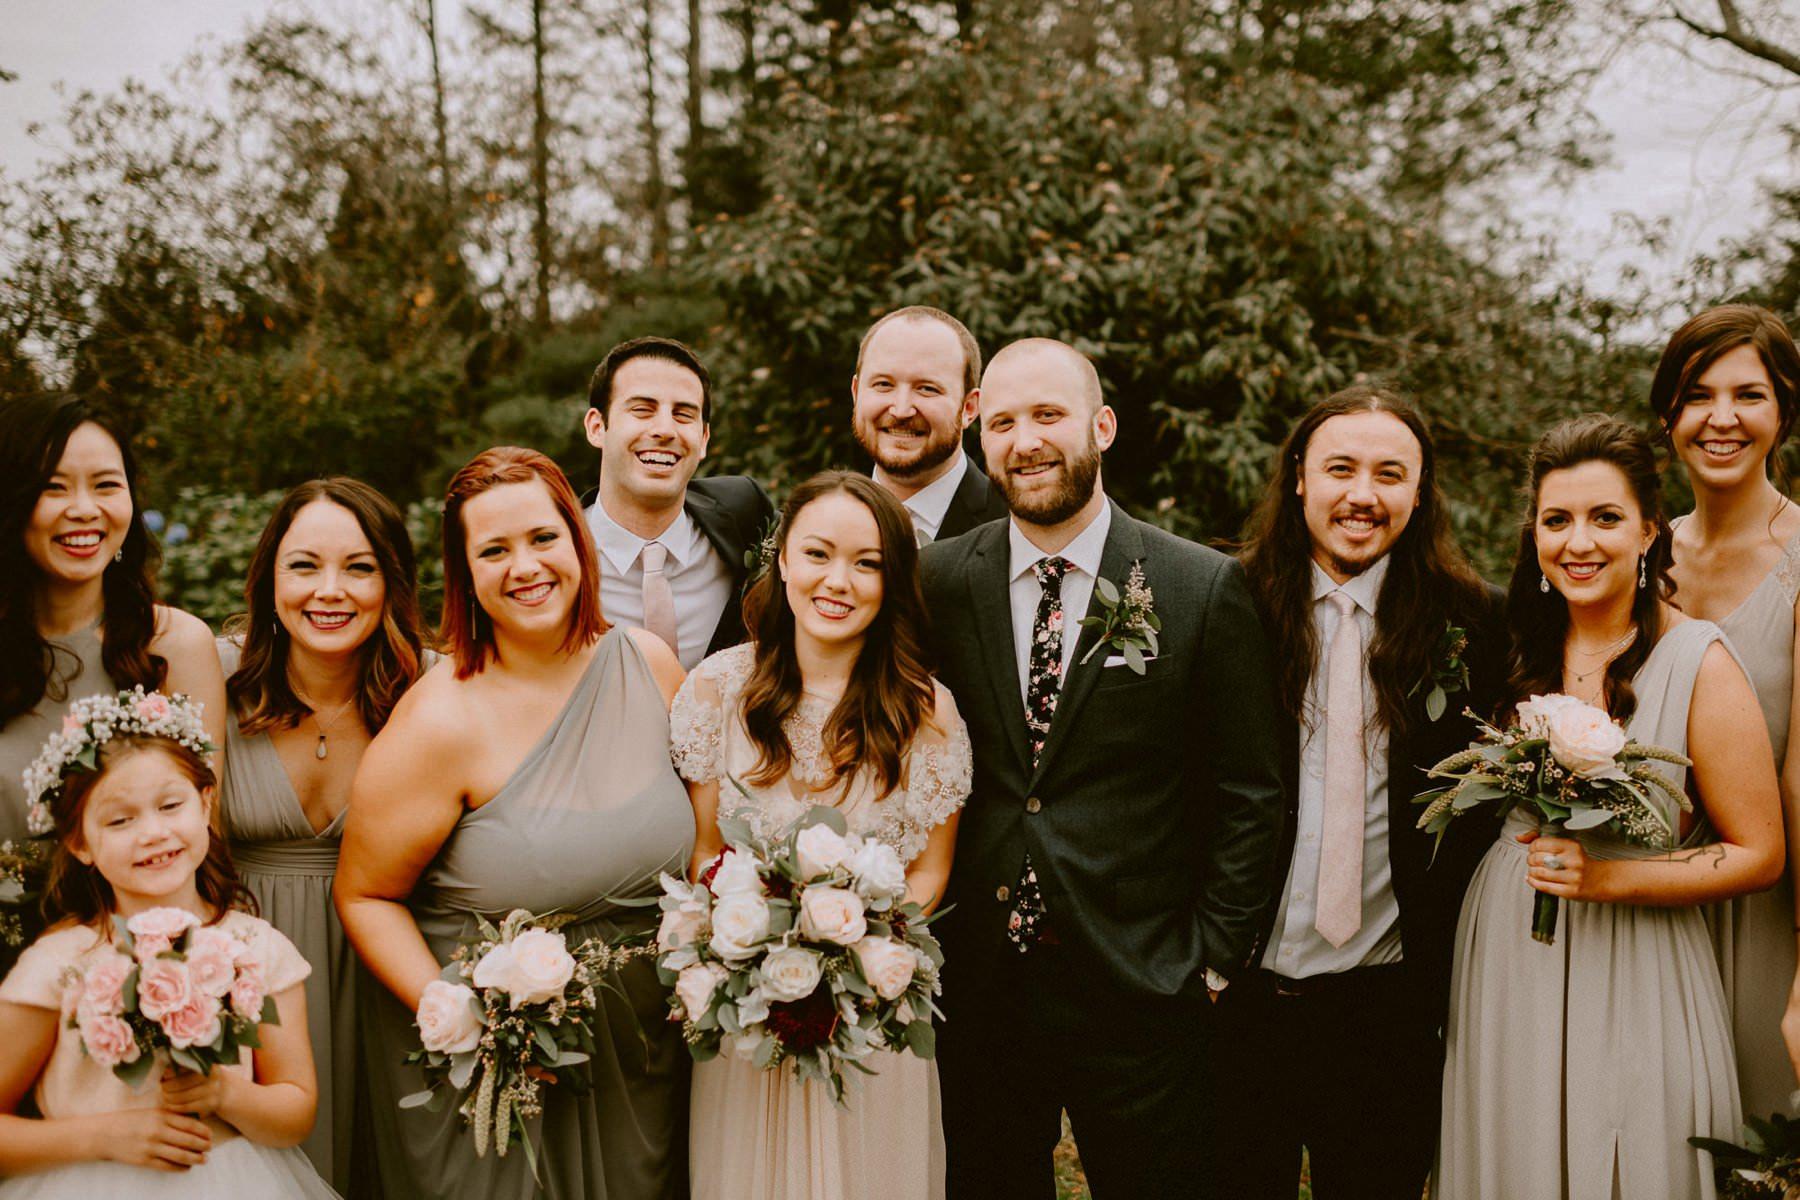 Tyler_arboretum_wedding-030.jpg